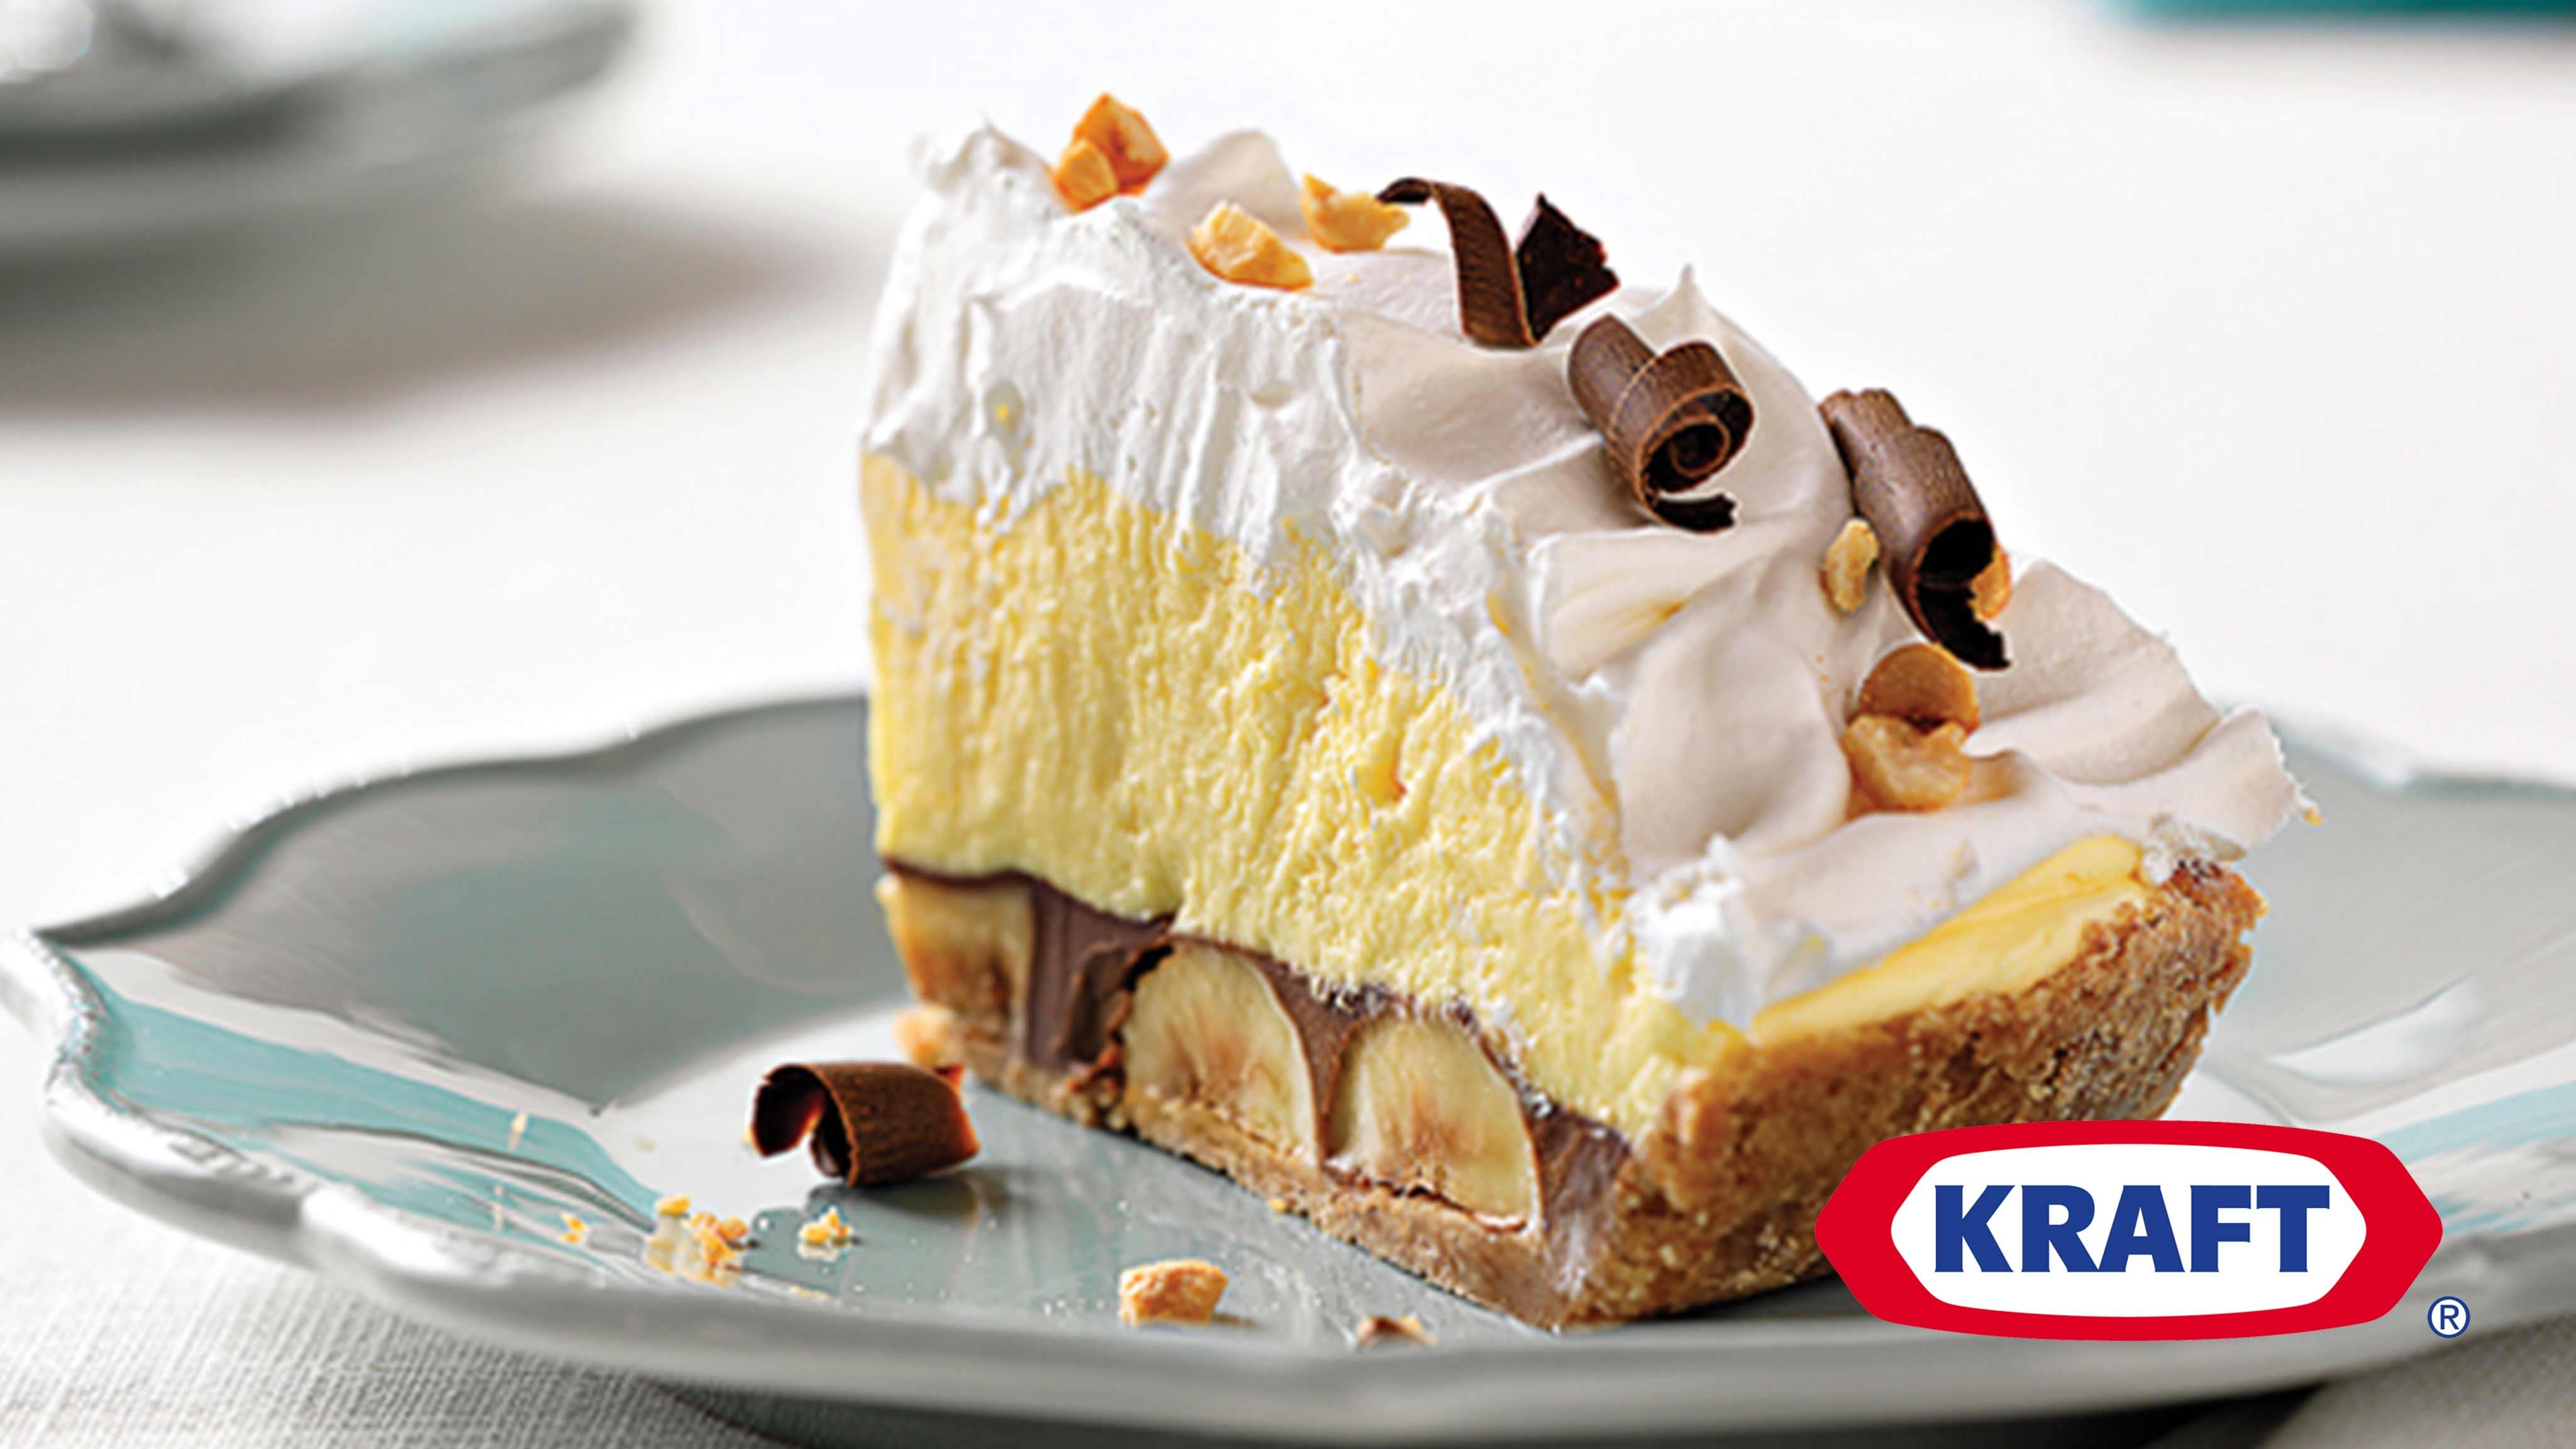 Image for Recipe Peanut Butter Chocolate Banana Cream Pie